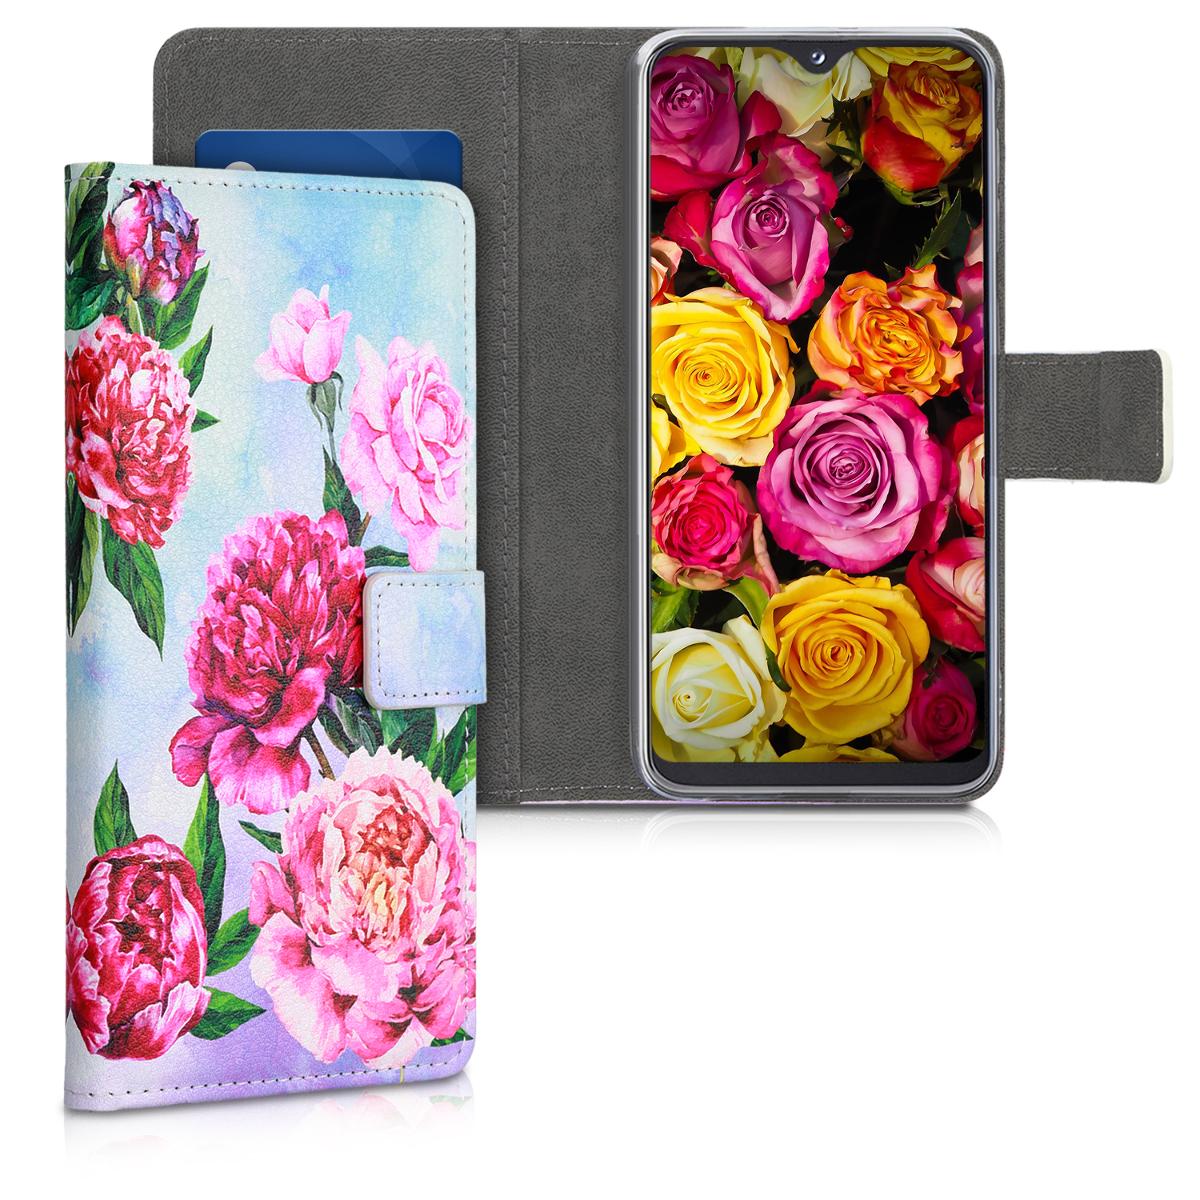 KW Θήκη - Πορτοφόλι Samsung Galaxy A20e - Violet / Light Pink / Light Blue (48742.10)